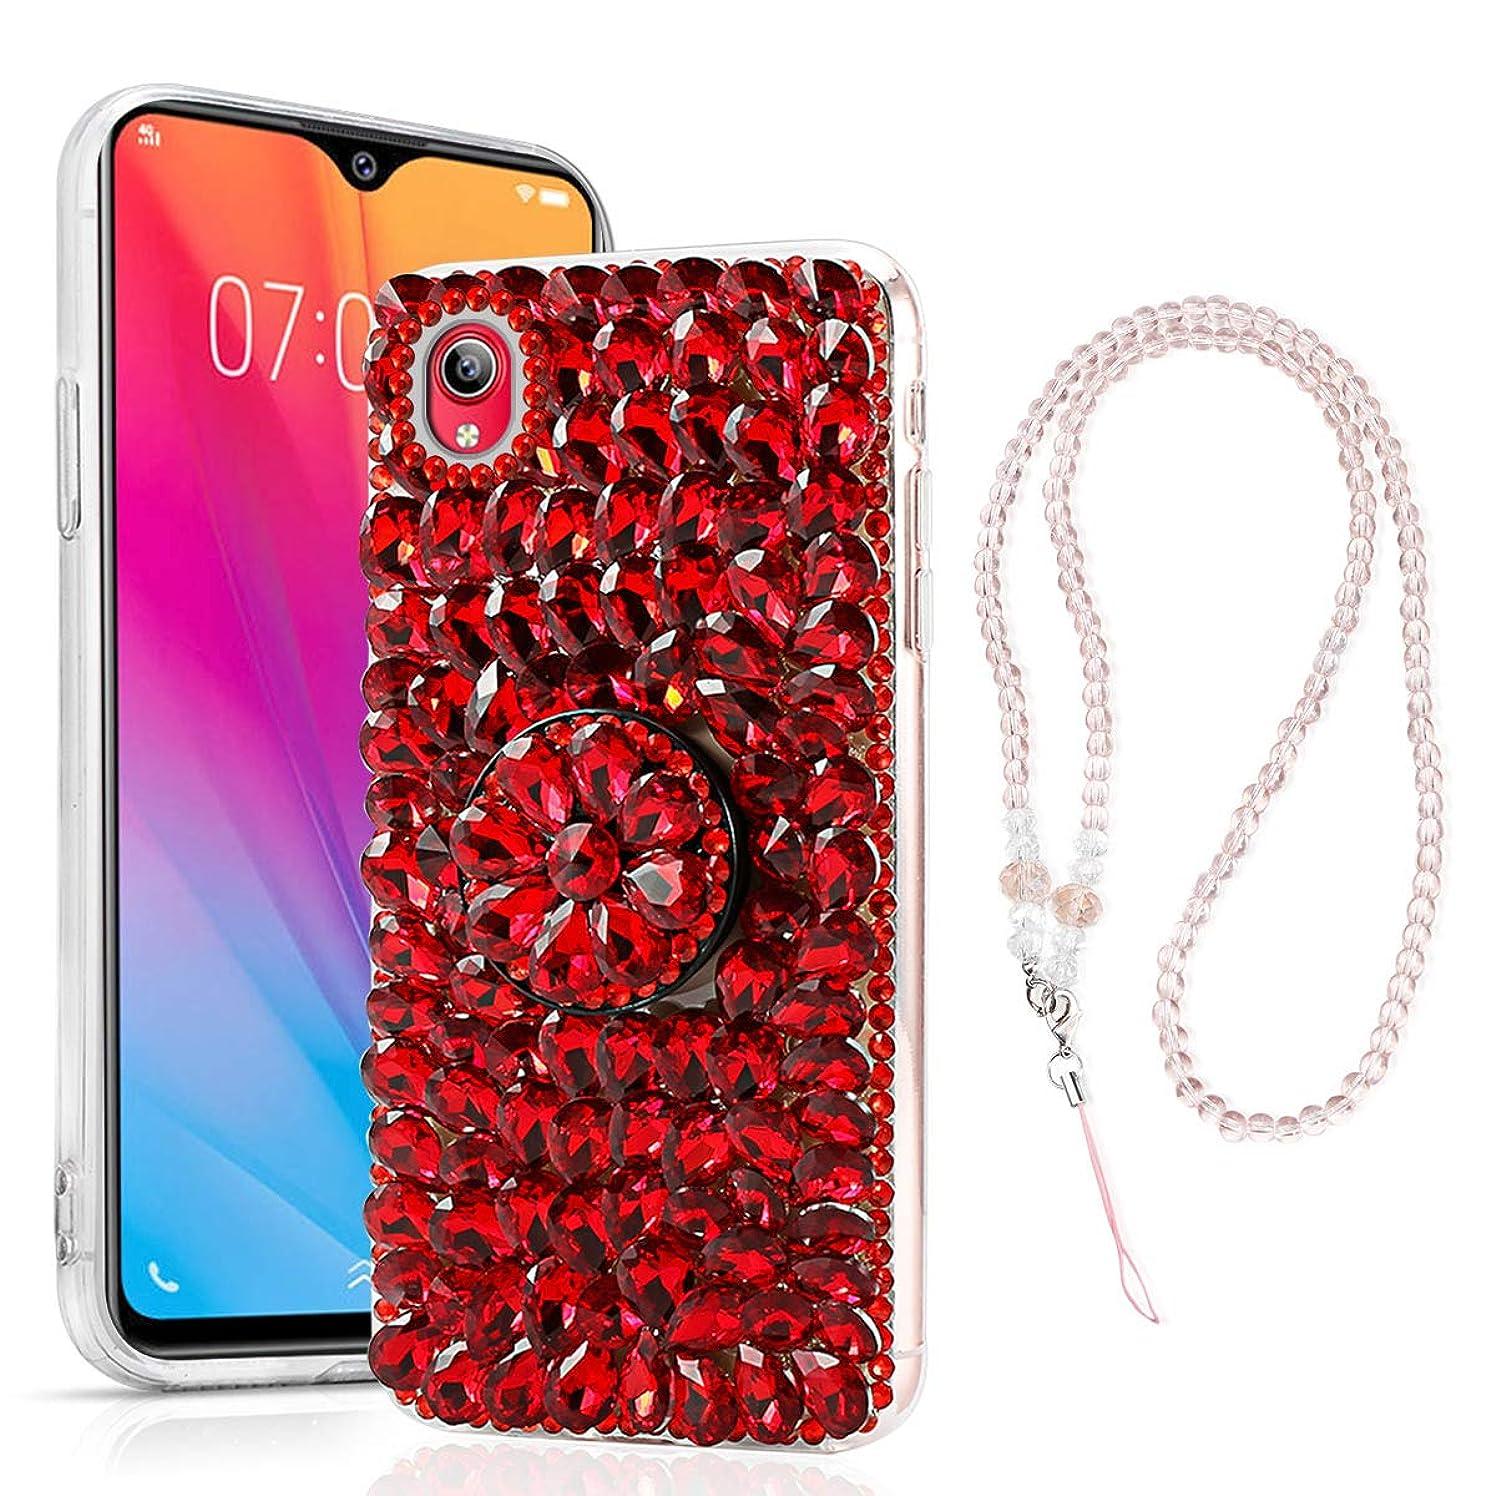 Torubia Diamond Phone Cover for Vivo Y91i,3D Handmade Bright Shining Rhinestone Shockproof Hard Back Case for Vivo Y91i-Red